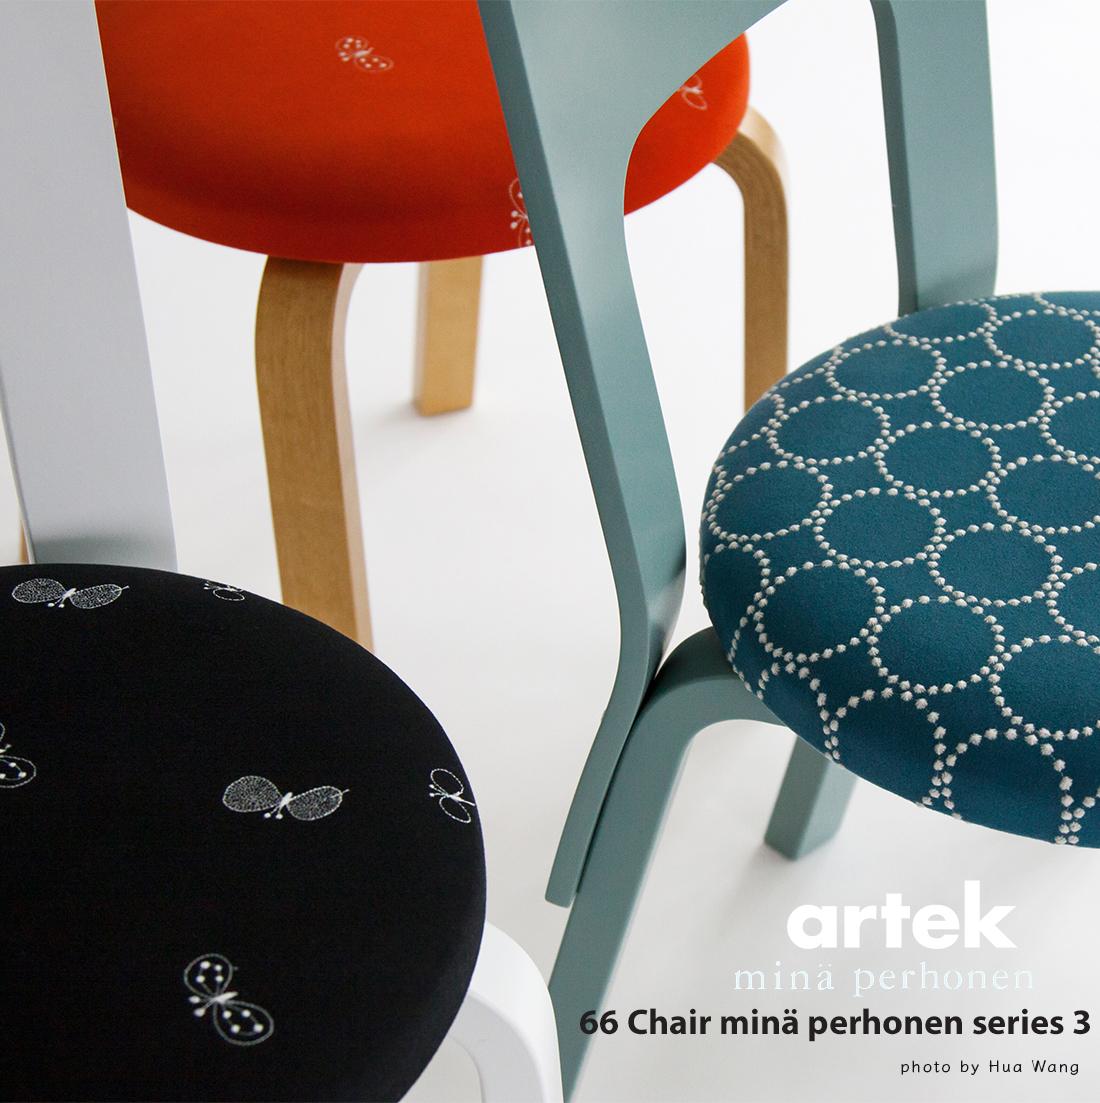 【Artek/アルテック】66 Chair minä perhonen series 3  66CHAIR 66チェア ミナ ペルホネン シリーズ3 アルヴァ アアルト Stool60 dop tambourineAlvar Aalto 皆川 明 椅子 チェア 北欧 フィンランド ミナペルホネン